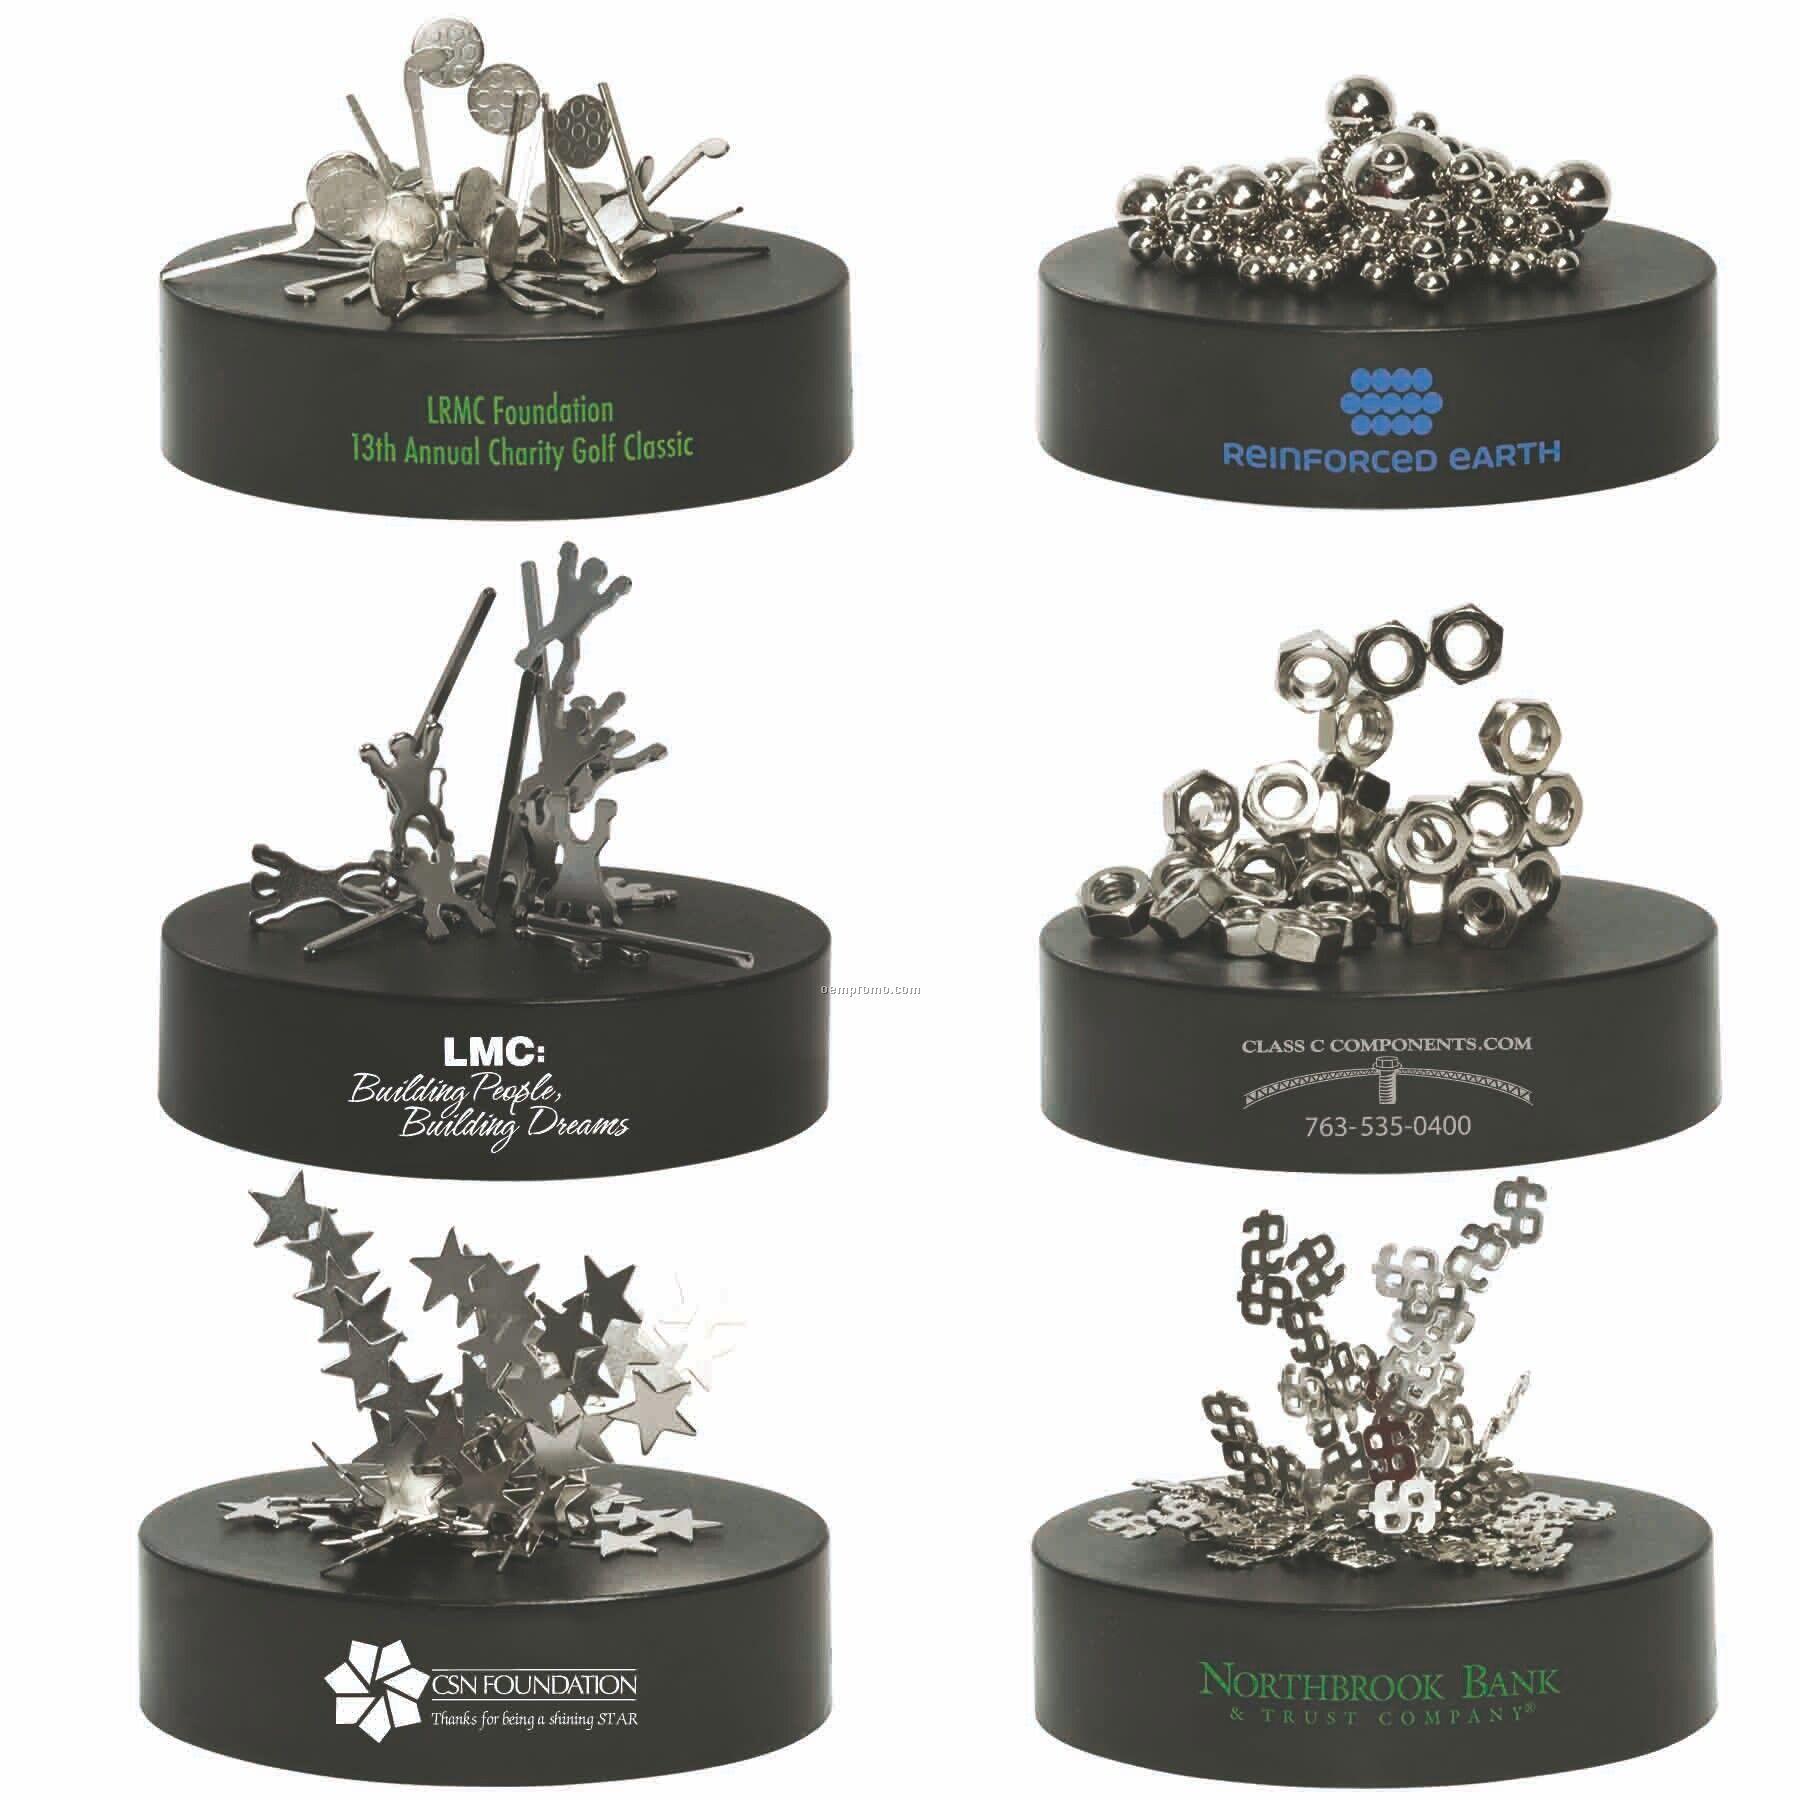 Magnetic Desk Sculptures - Executive Toy